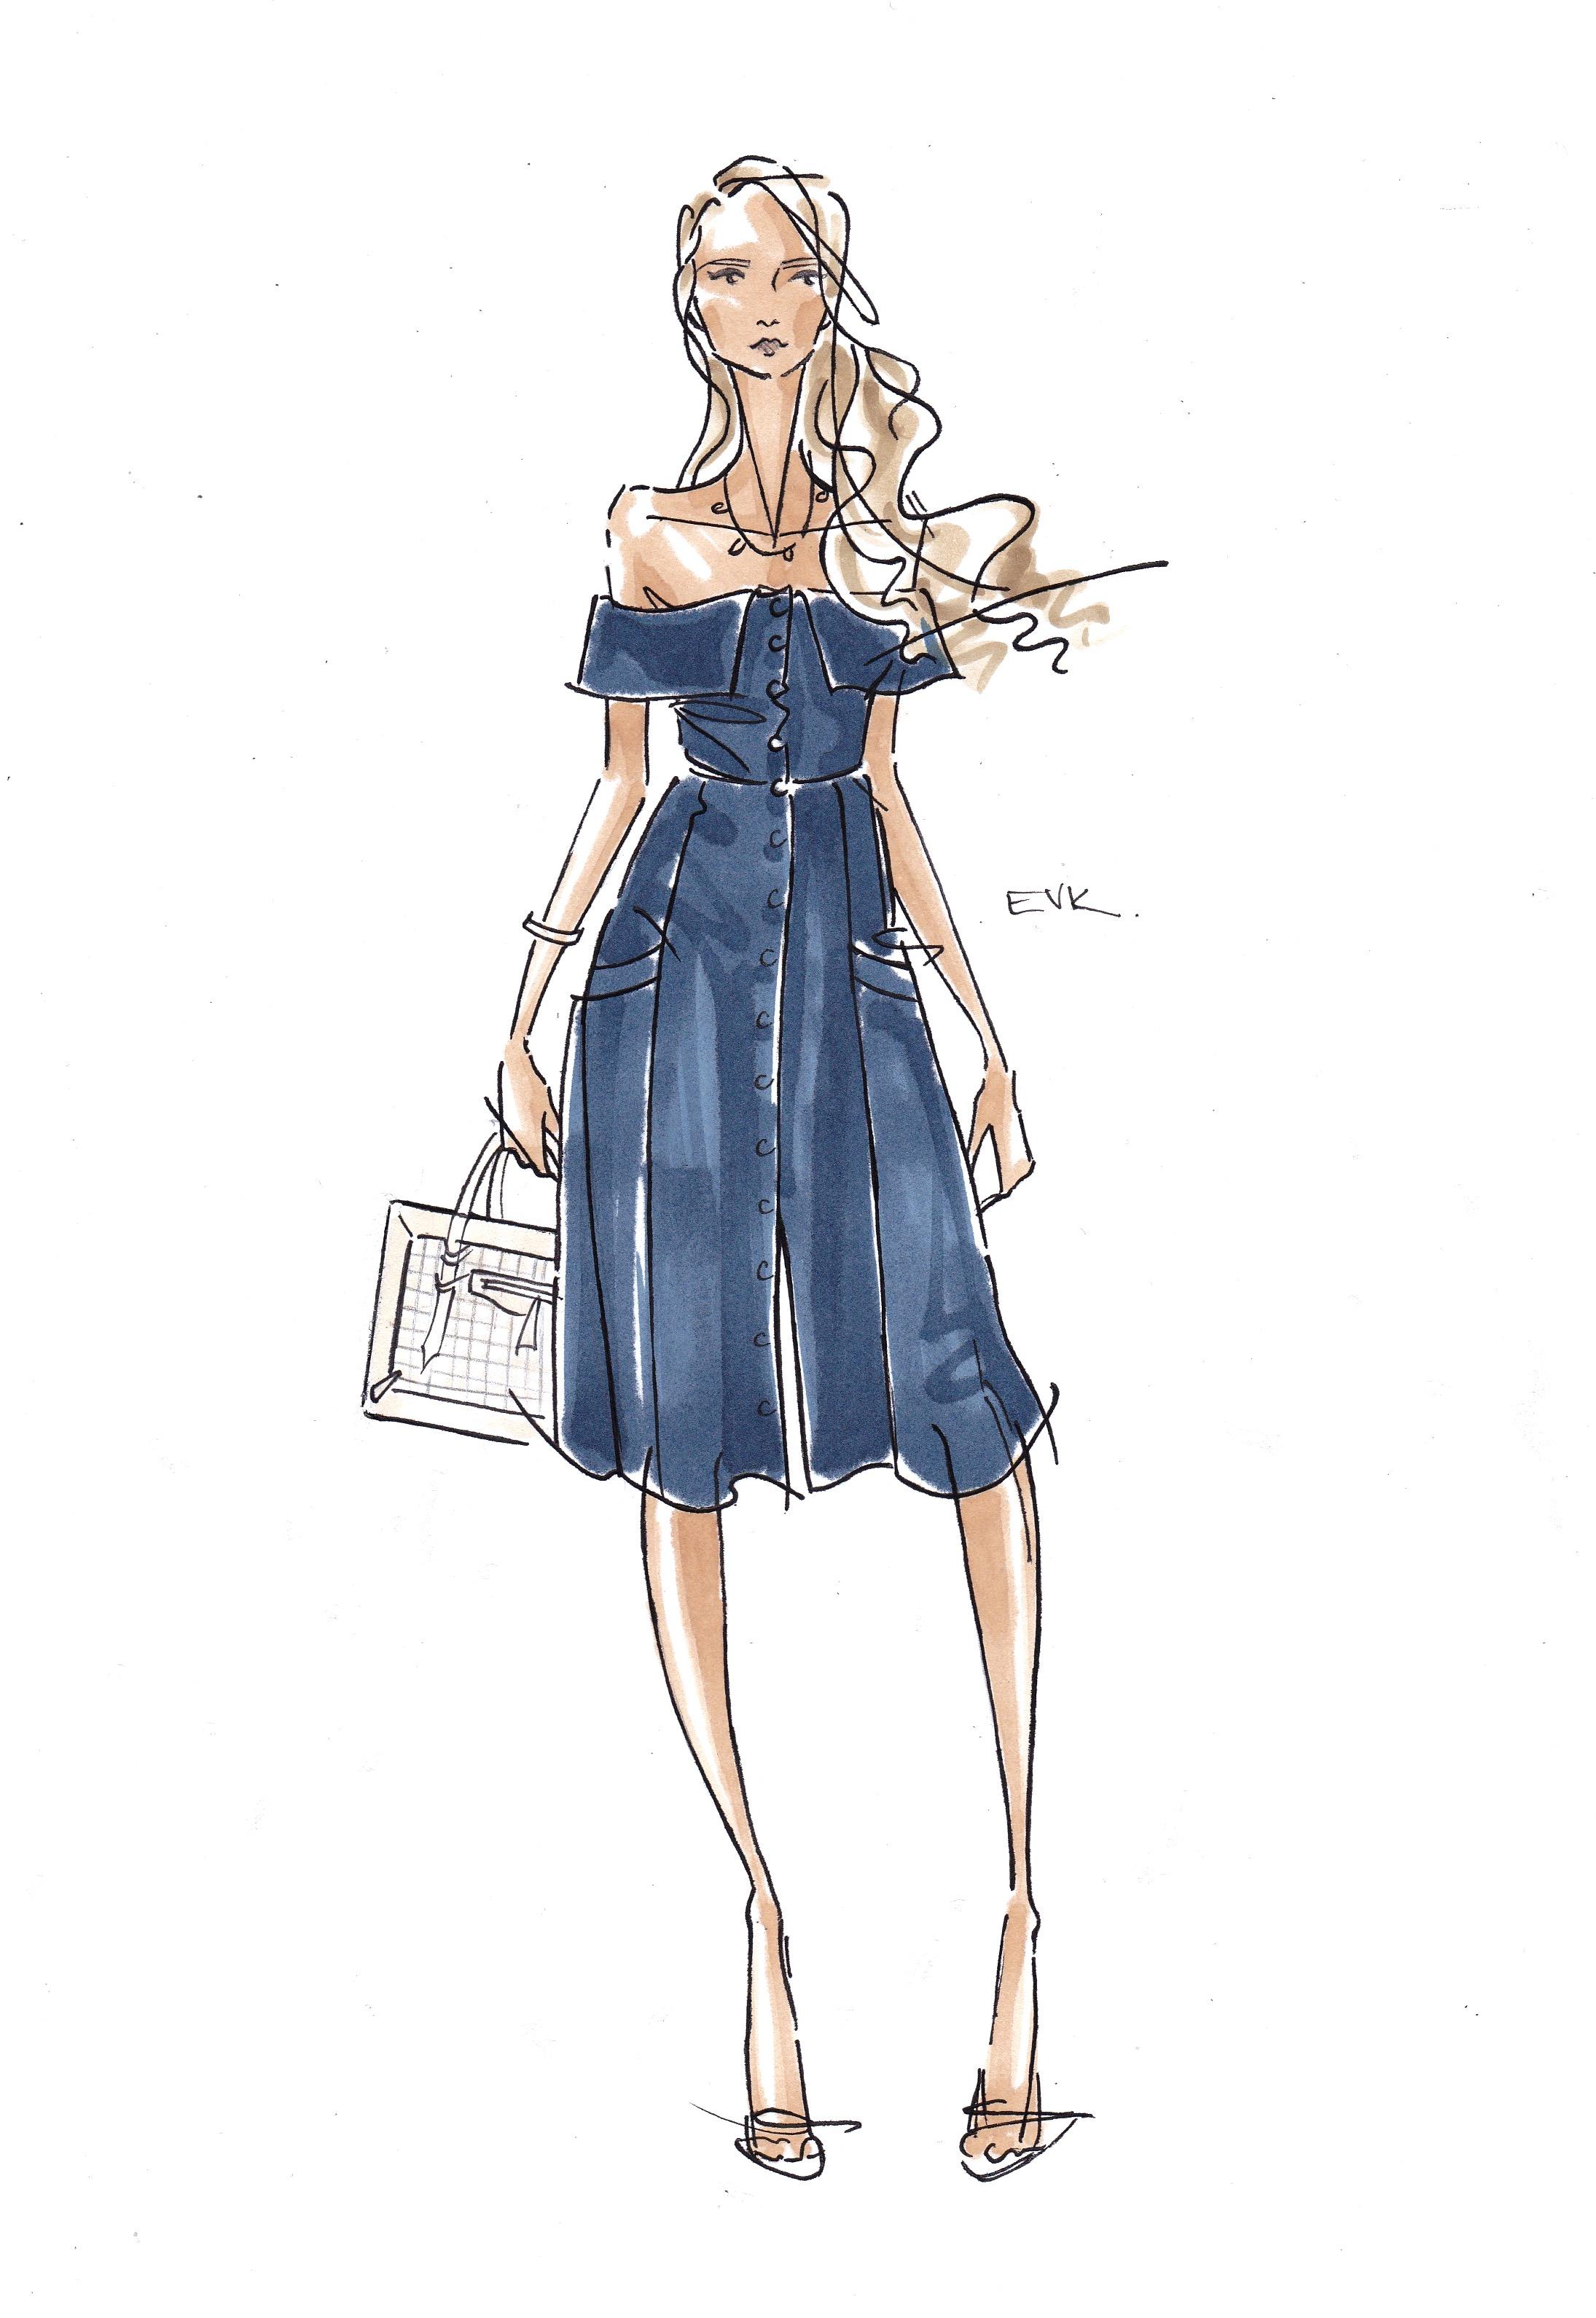 Amanda Norgaard + Structured Off-The-Shoulder - Copenhagen Fashion Week SS16  (2015) Marker, ink, pencil on archival bond, 11 x 8 inches © 2015 Elise Vavrus Krohn